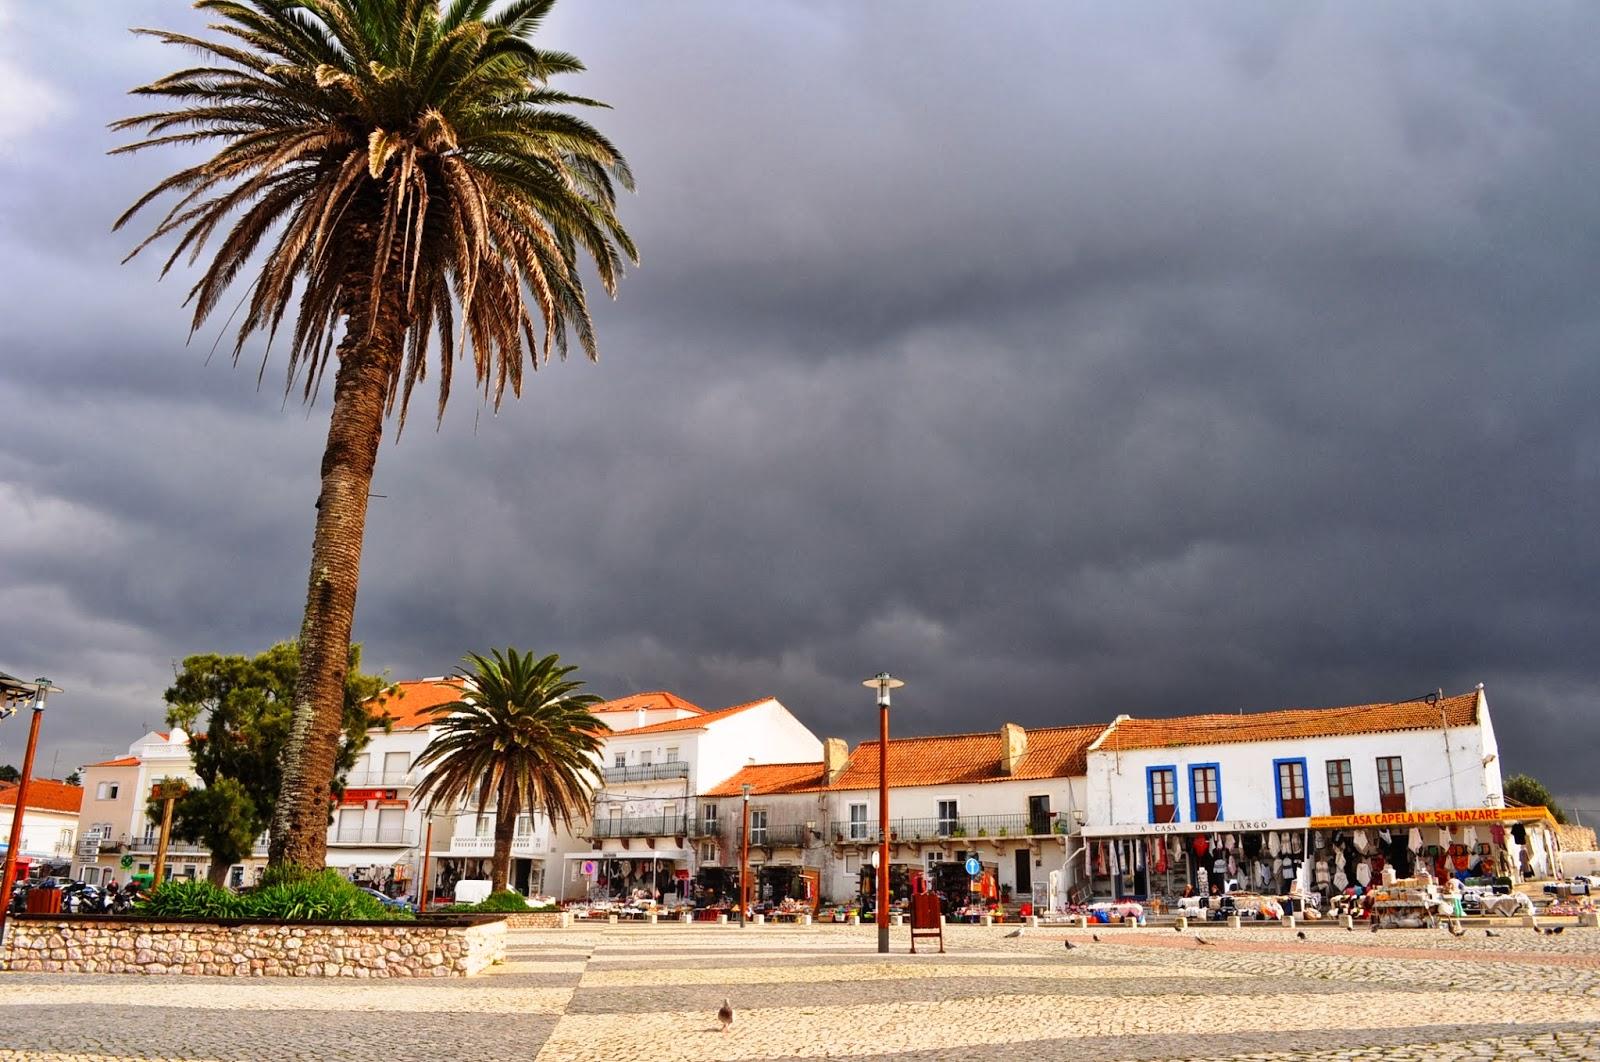 Поредното живописно рибарско градче Назаре ни посреща с драматично, оловно небе.